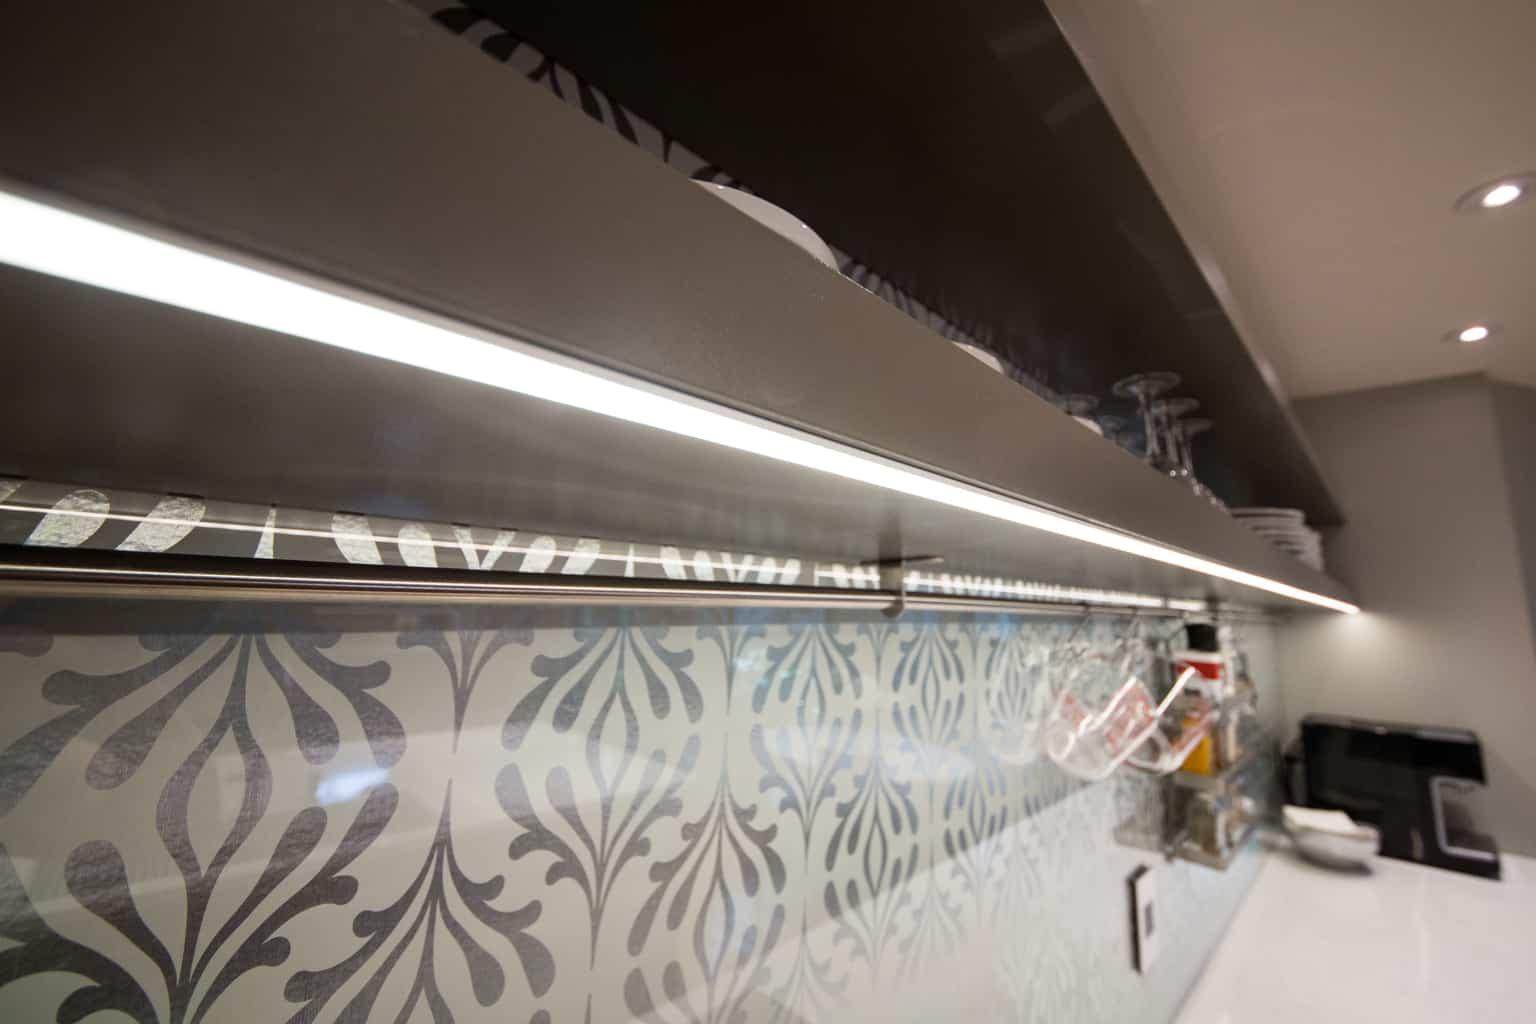 cabinet light lighting wide high under orion strip led photos power